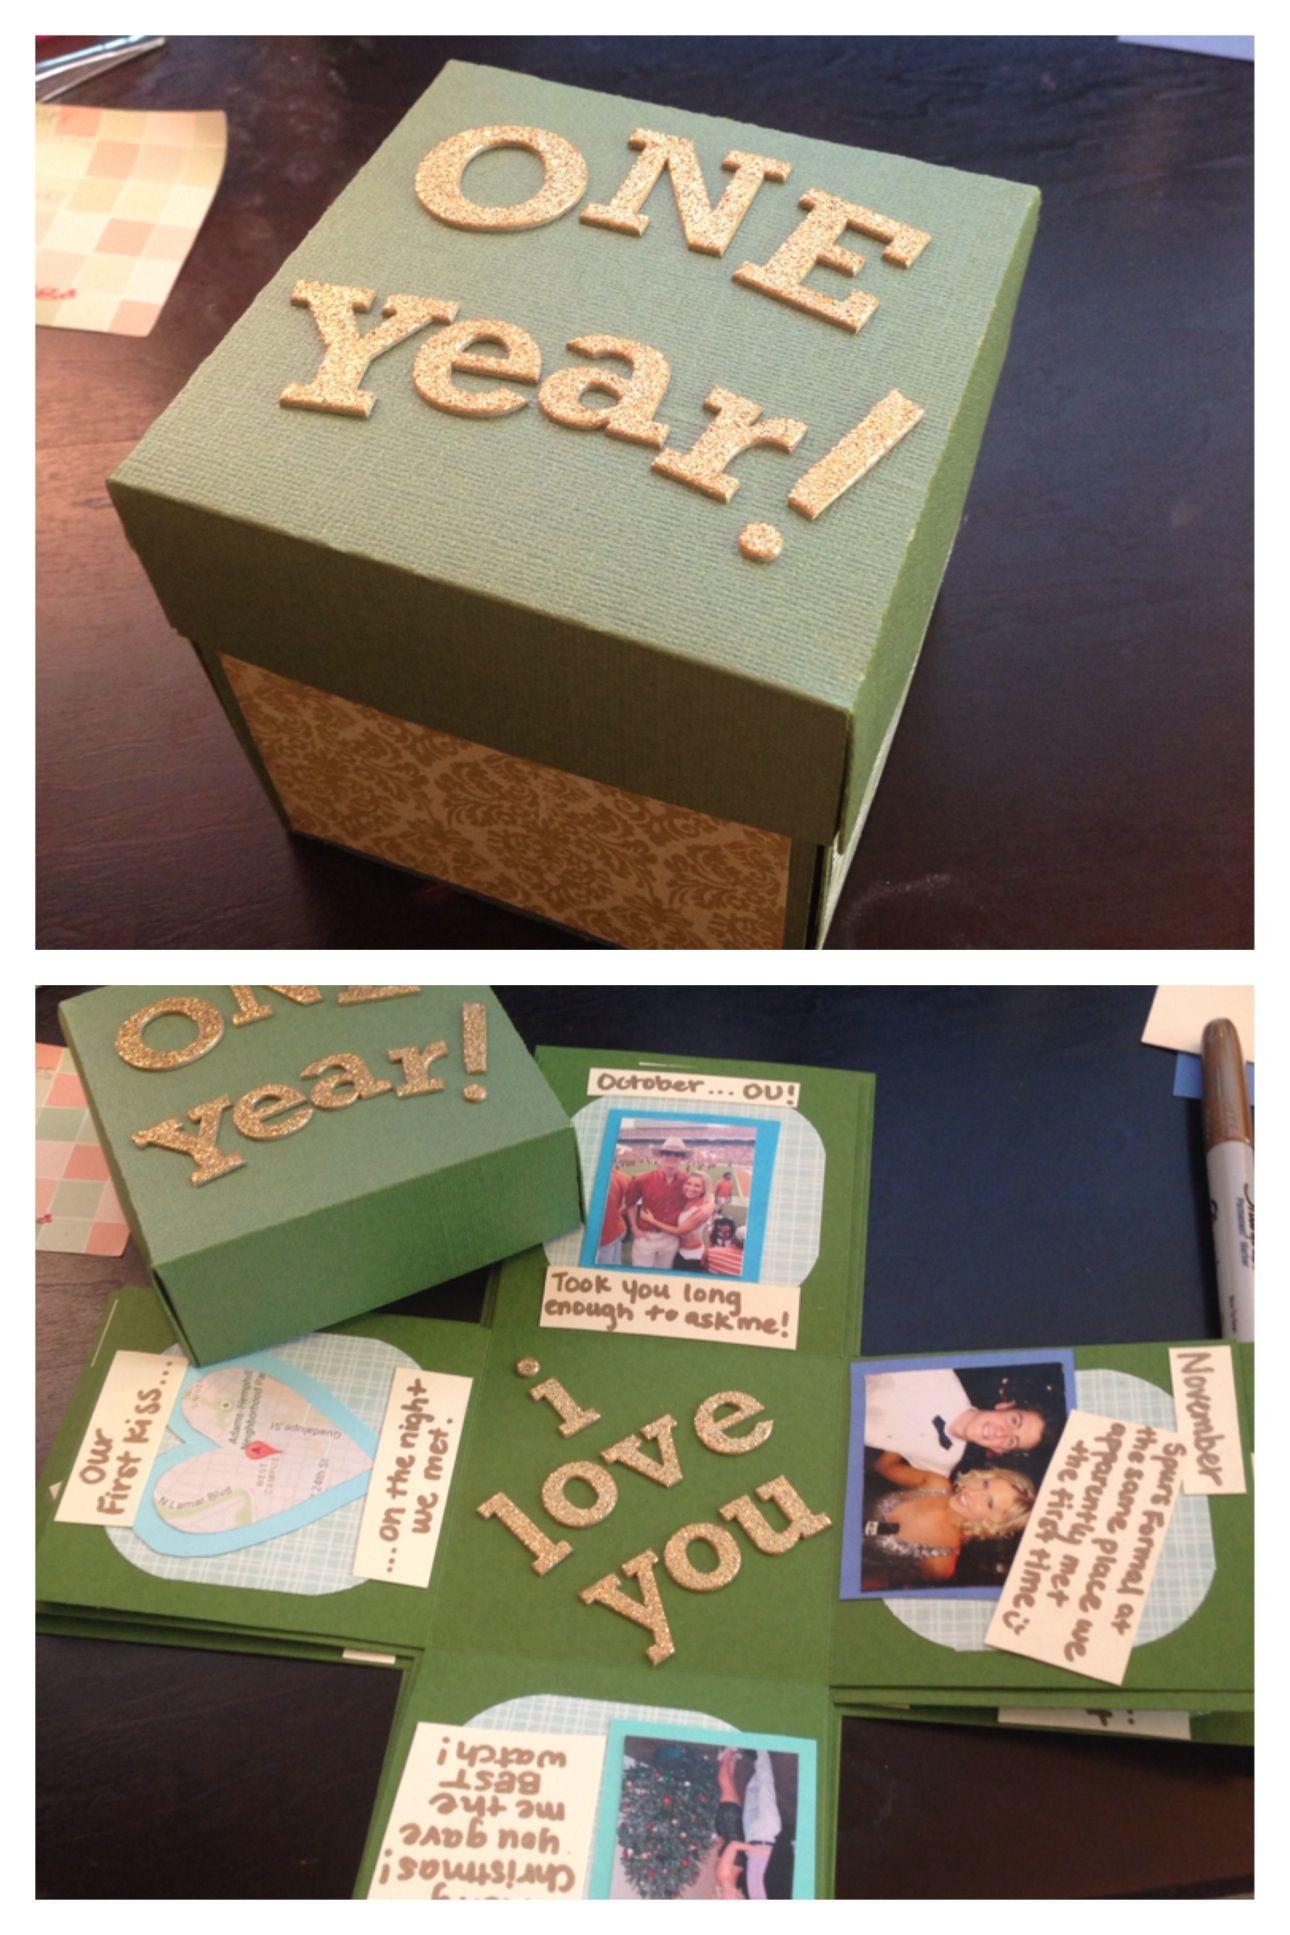 Cute Gift Ideas For Your Boyfriend  Boyfriend Anniversary Gifts on Pinterest